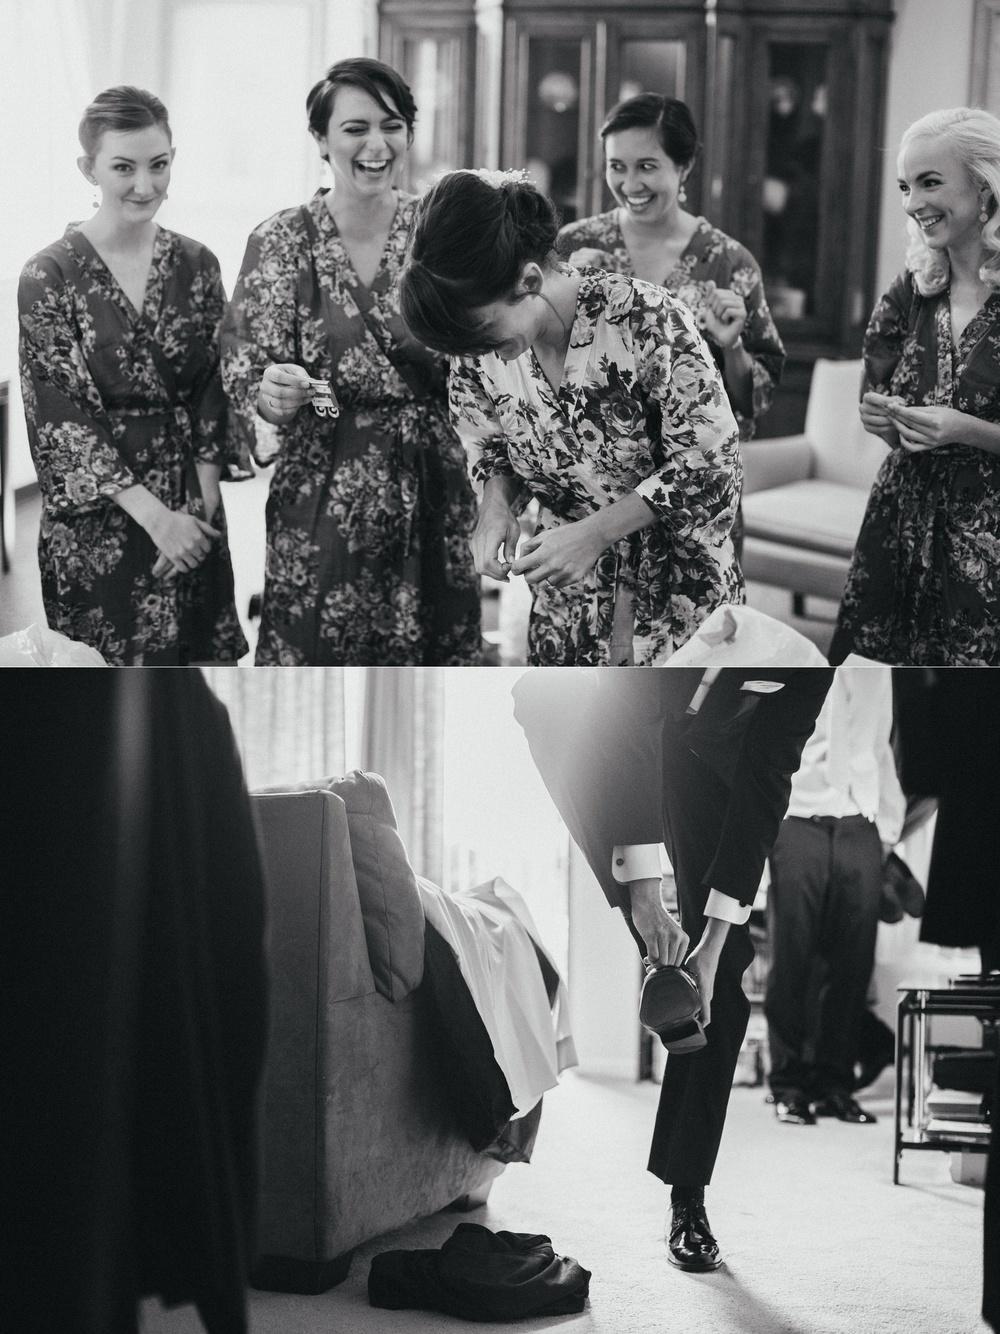 jake-and-katie-wedding-favorites-2015-11